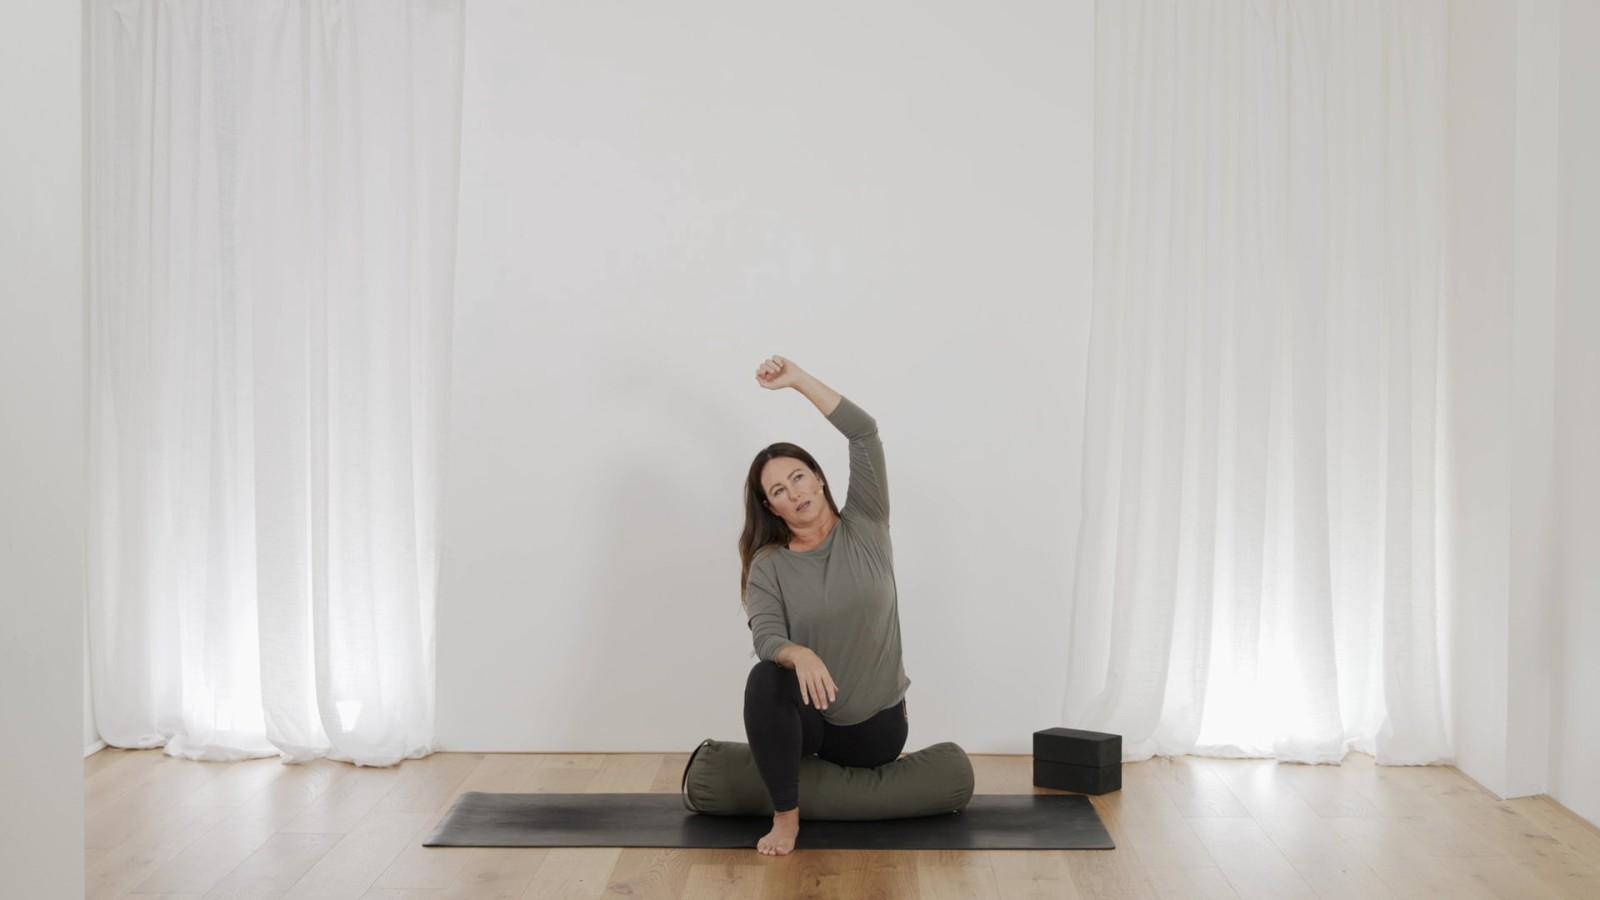 Yin Mandala For Your Hips with Mel McLaughlin